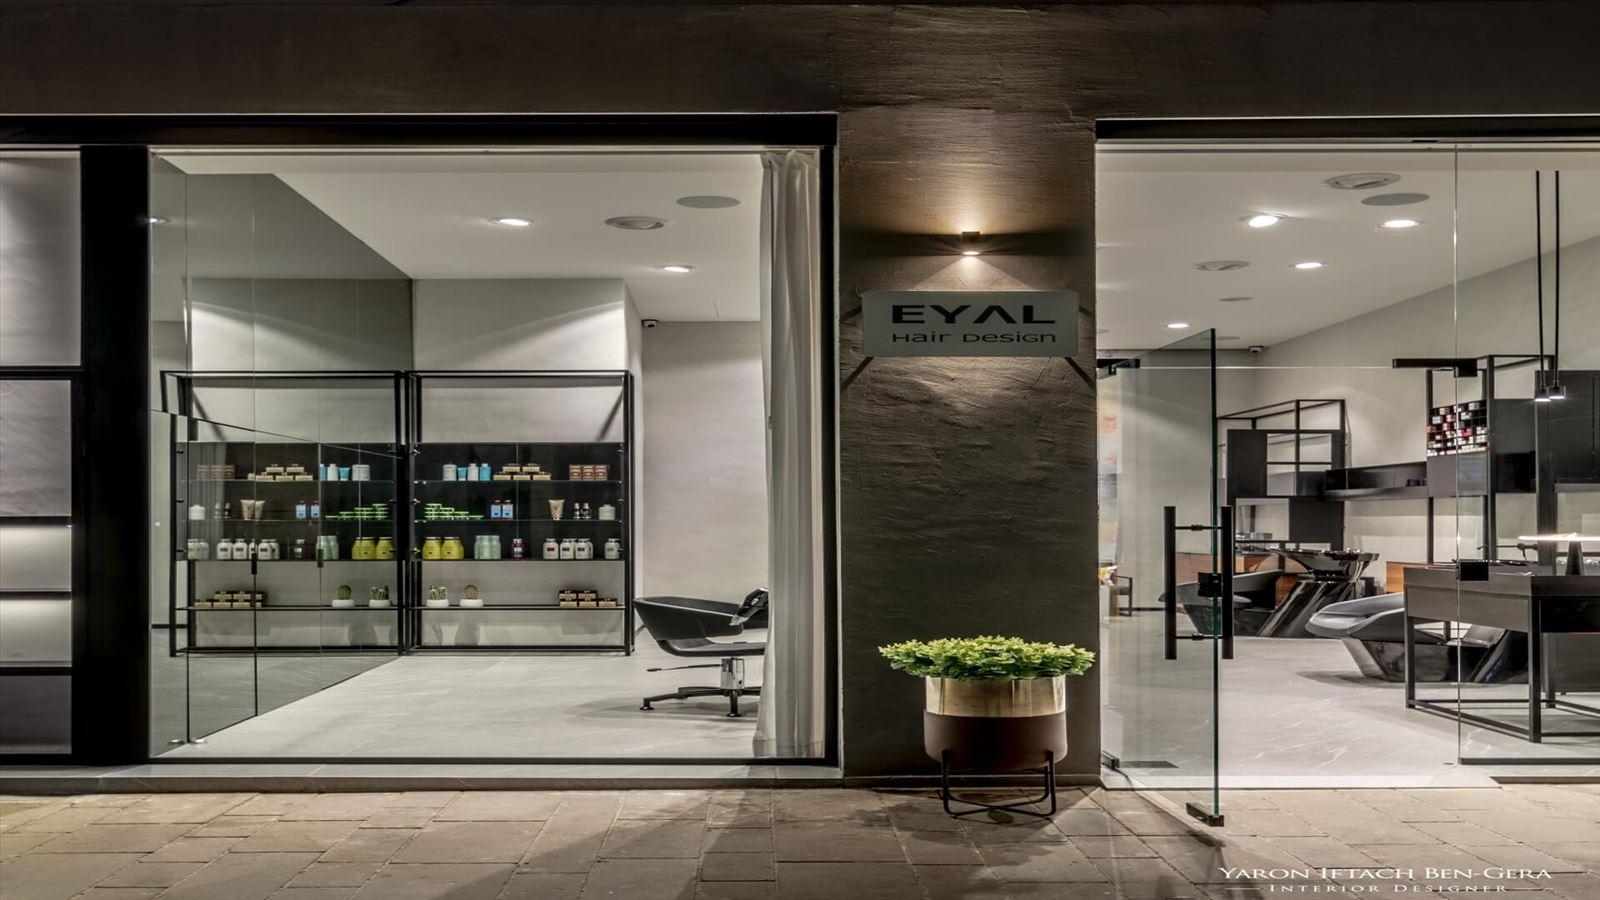 Boutique Hair Dressing Salon עיצוב התאורה שבמספרה על ידי דורי קמחי